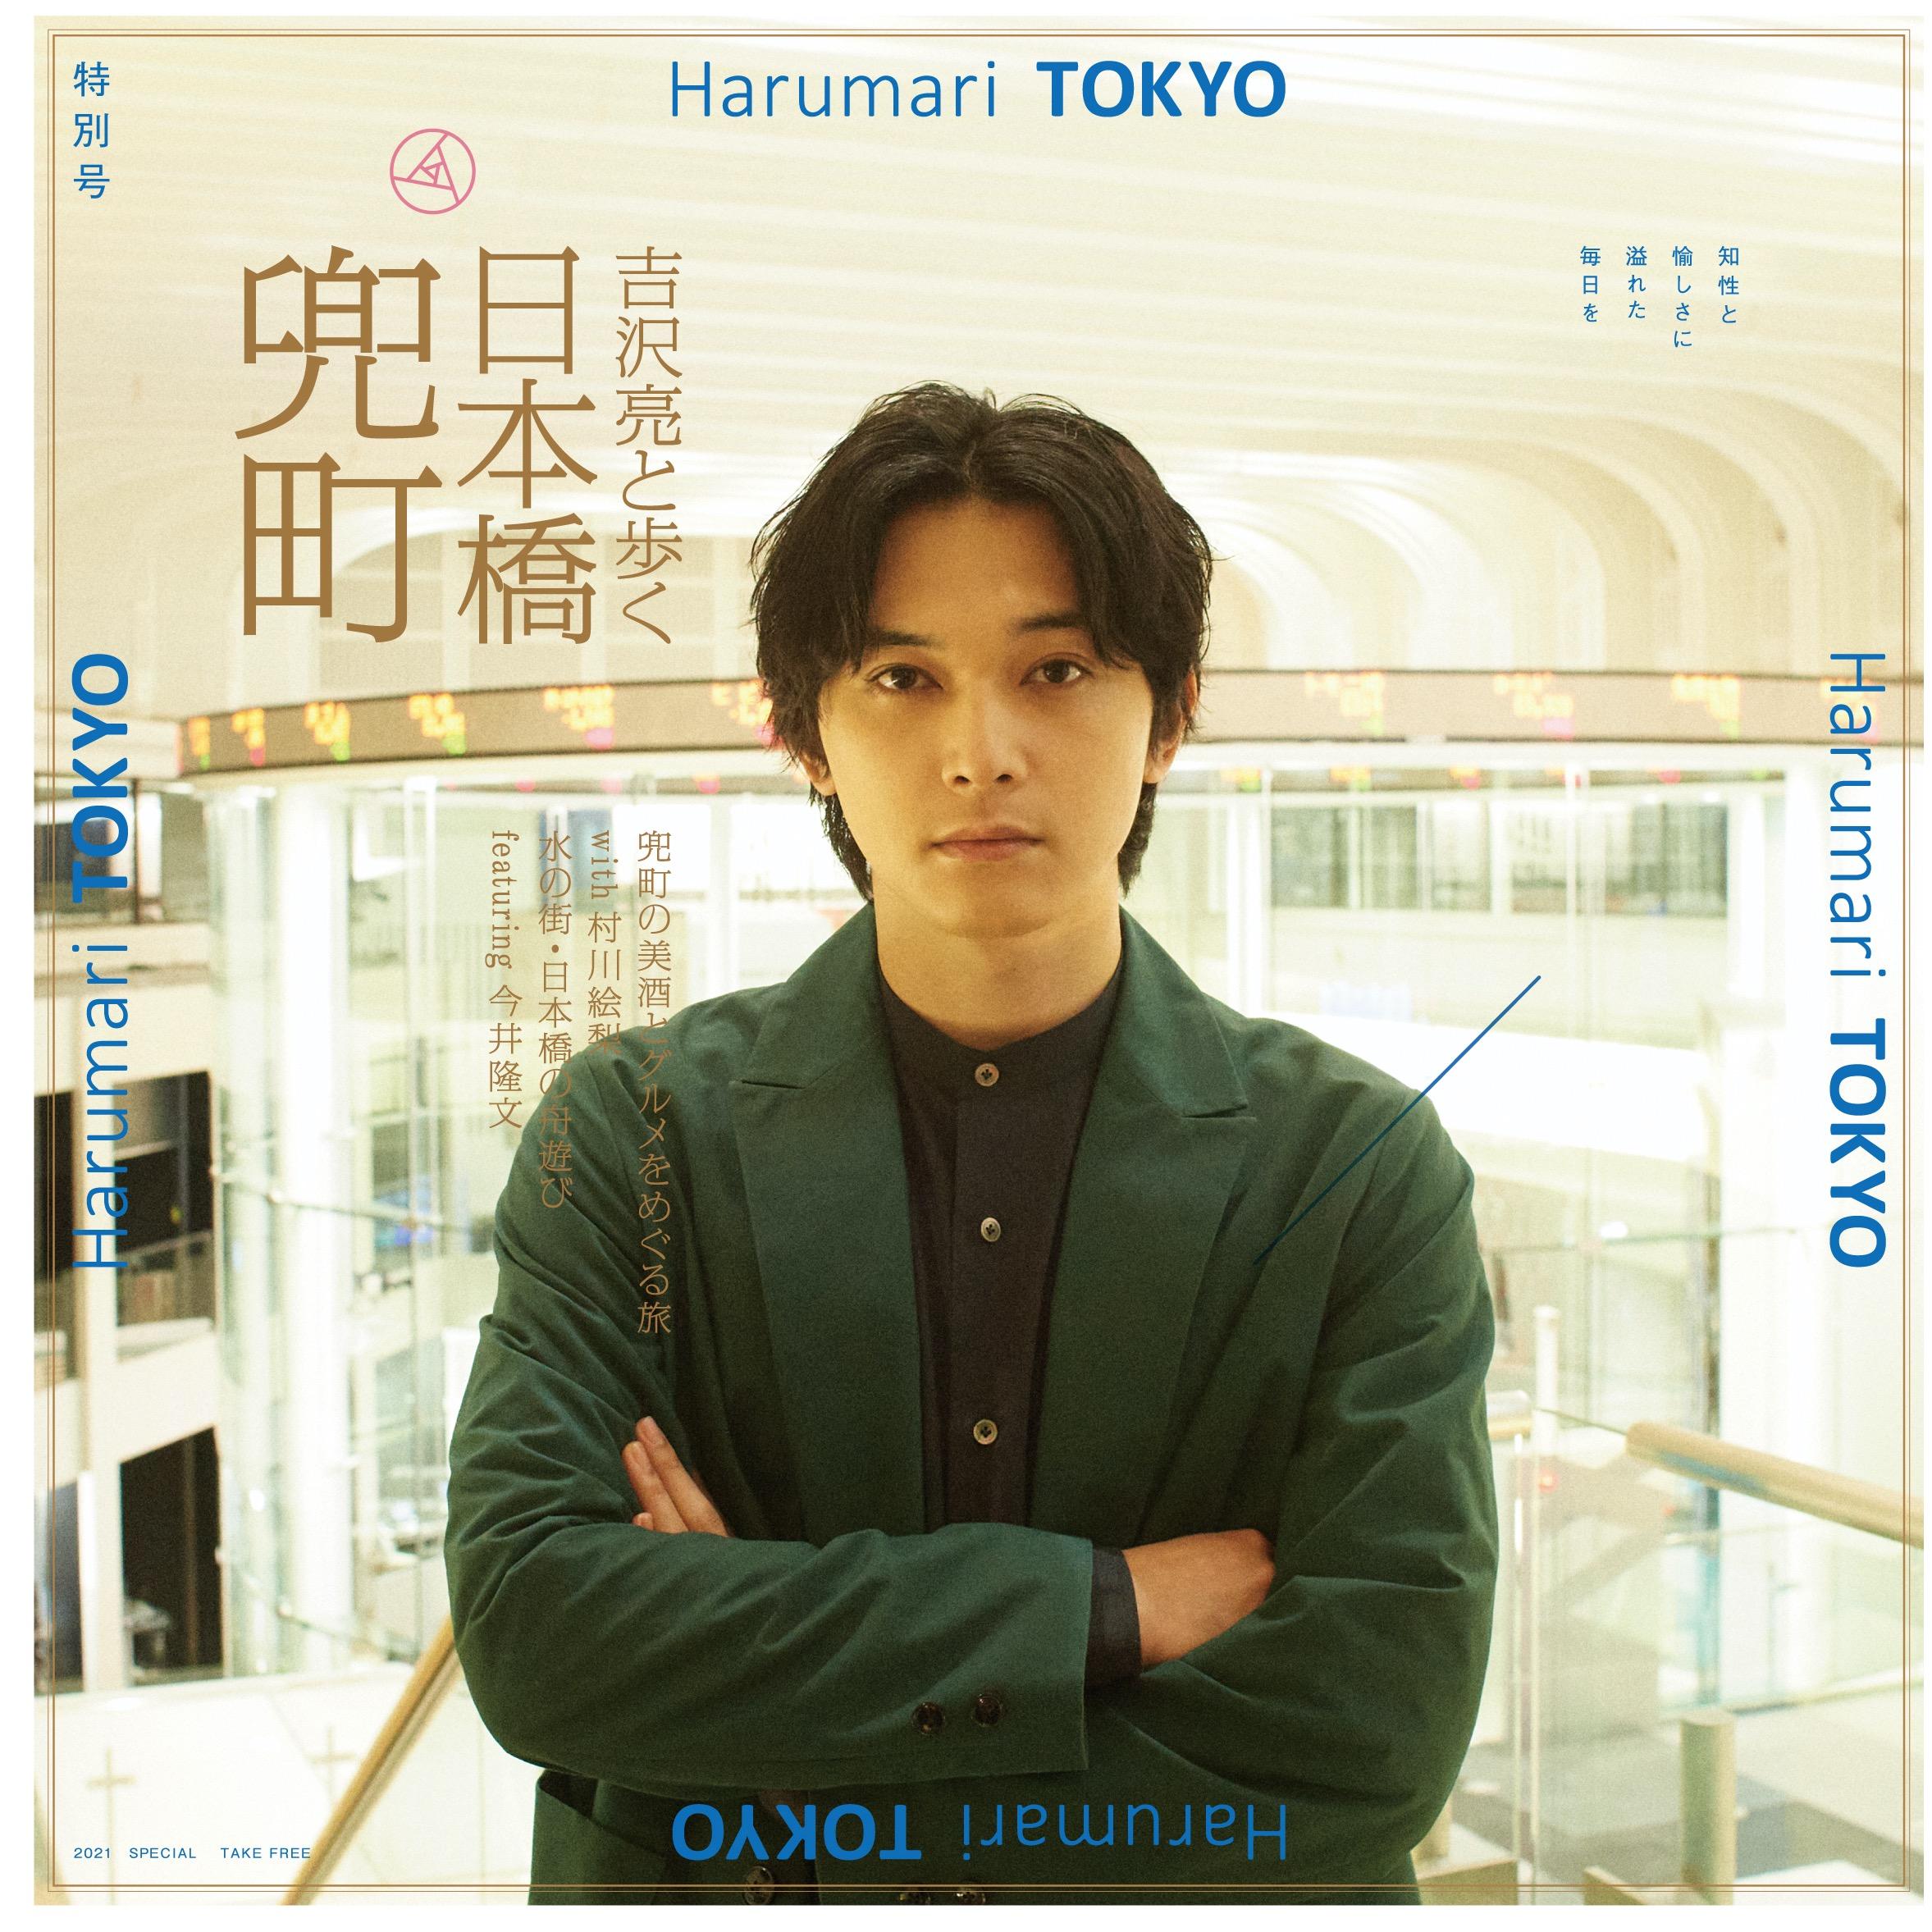 Harumari TOKYOフリーペーパー特別号。配布場所リスト・WEB販売のお知らせ